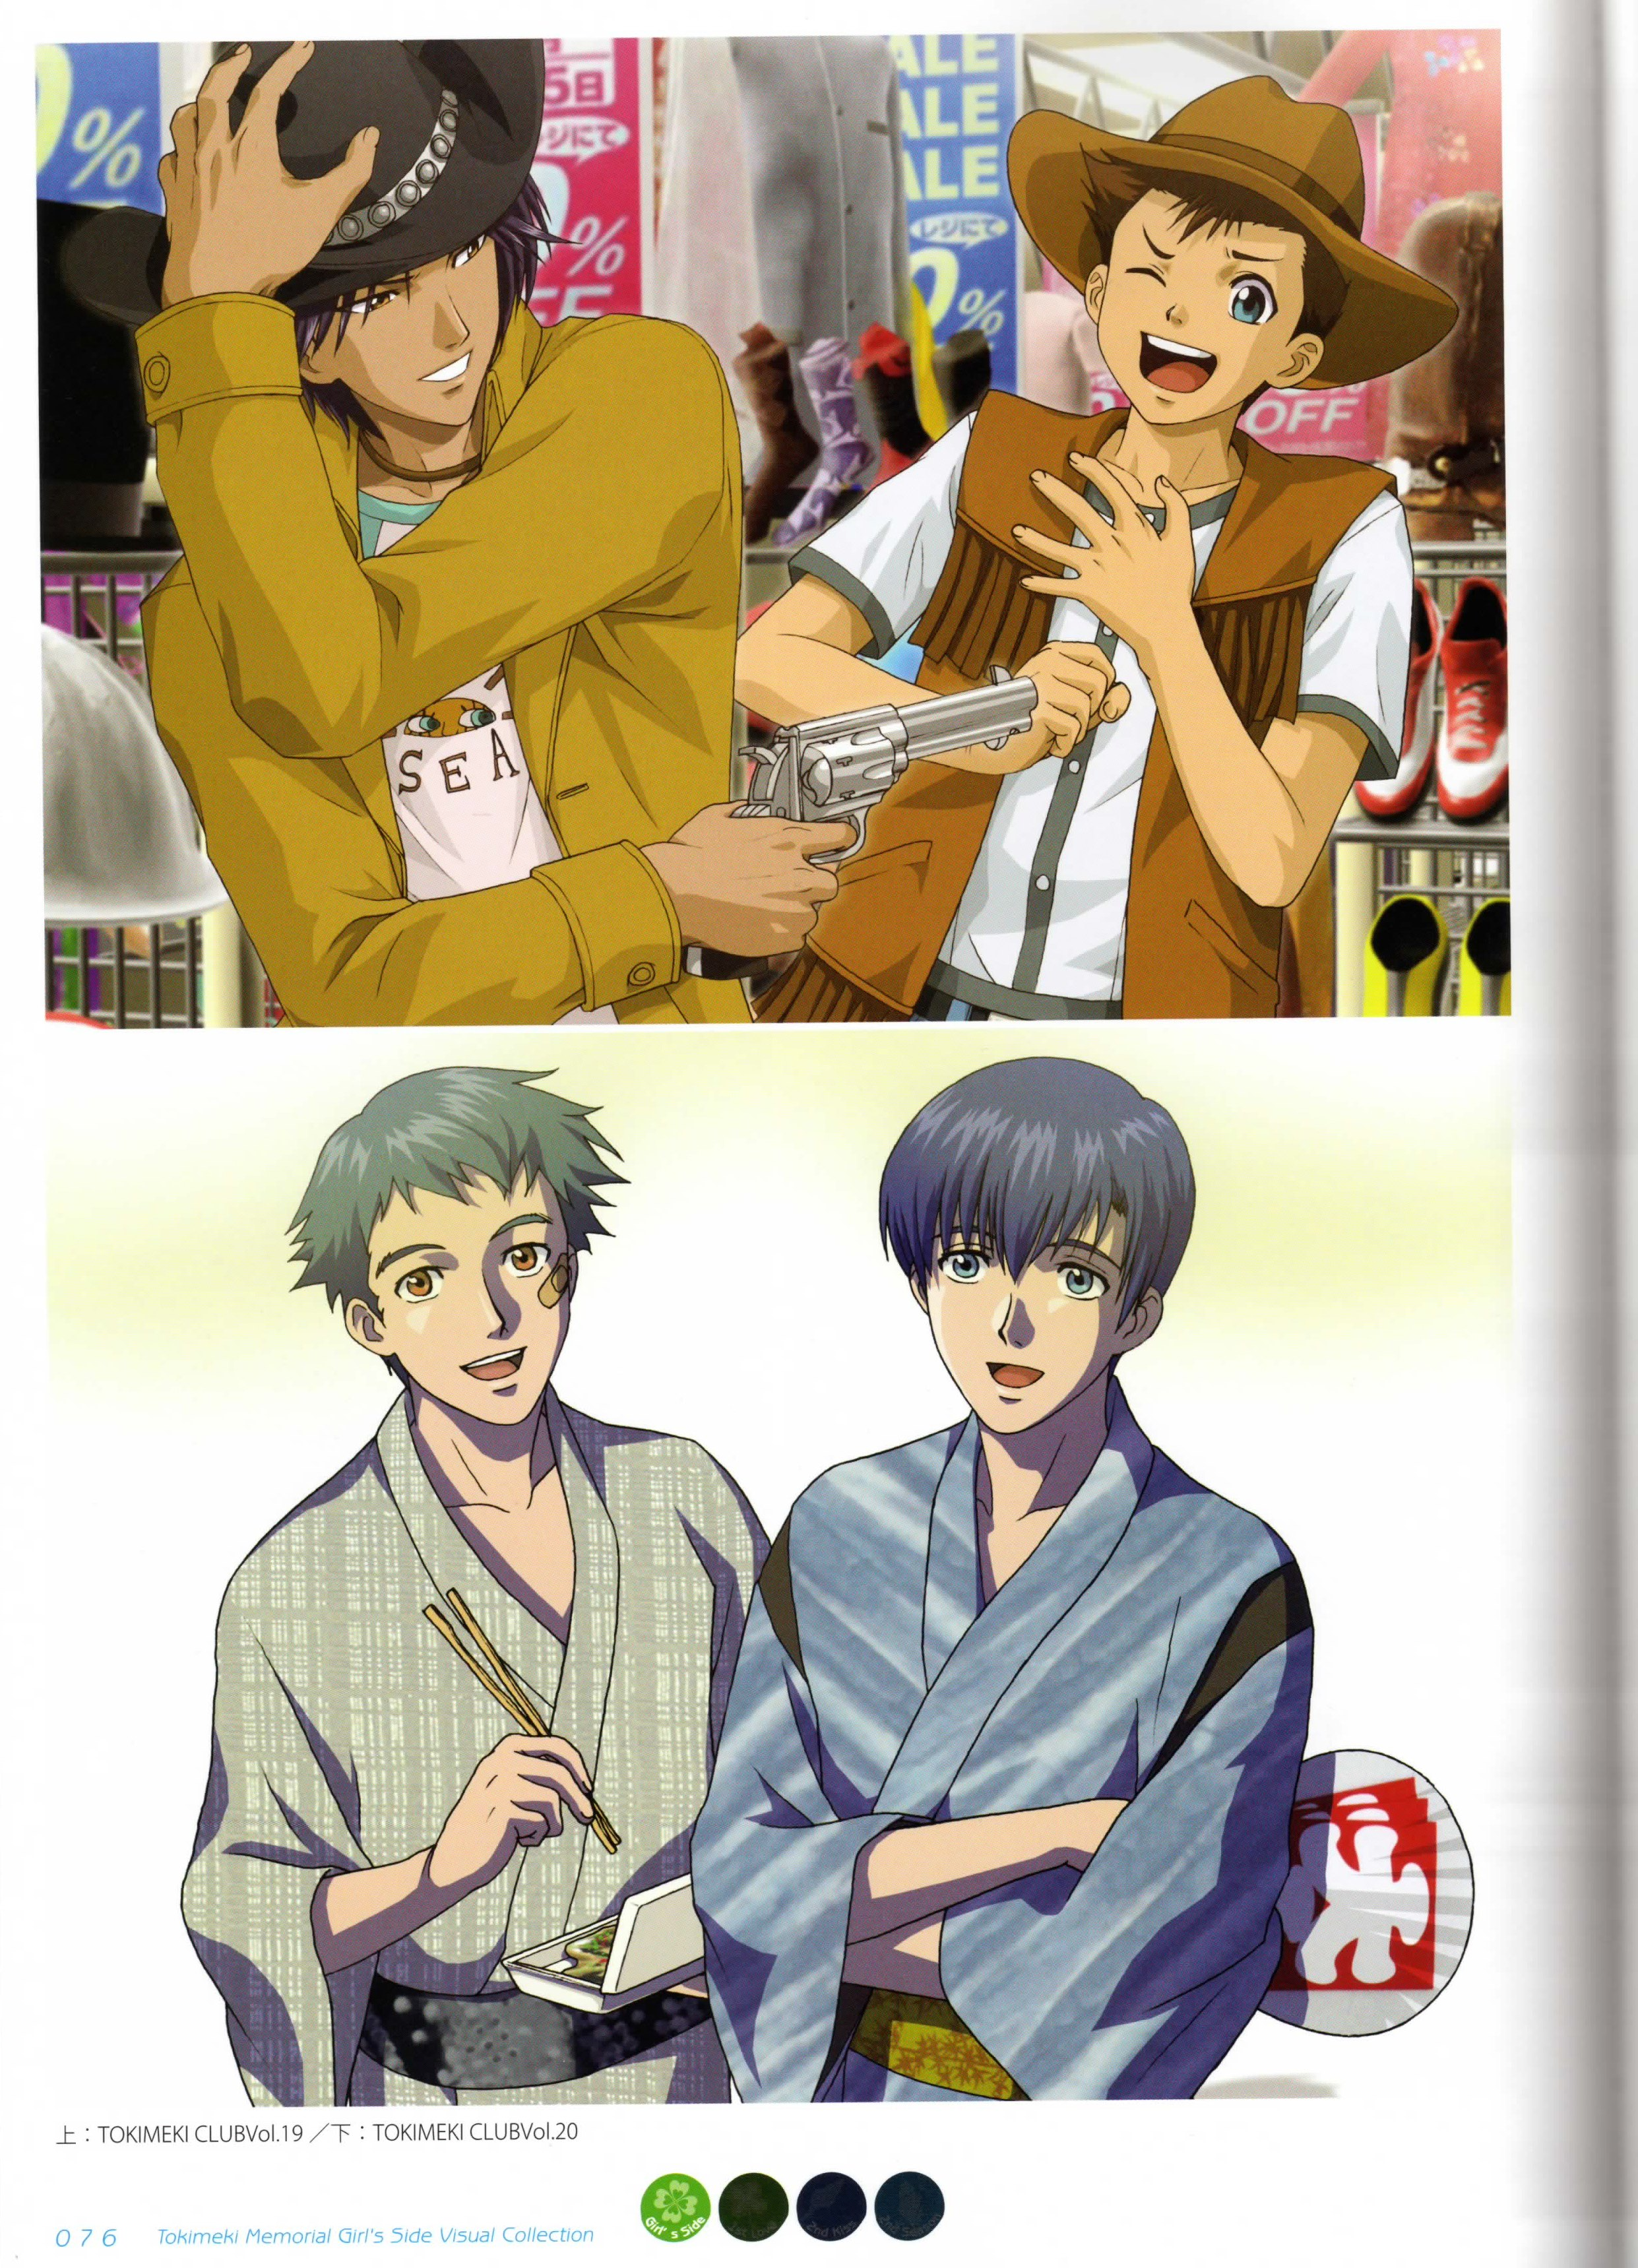 Tokimeki Memorial Girl S Side 1st Love Image 477167 Zerochan Anime Image Board